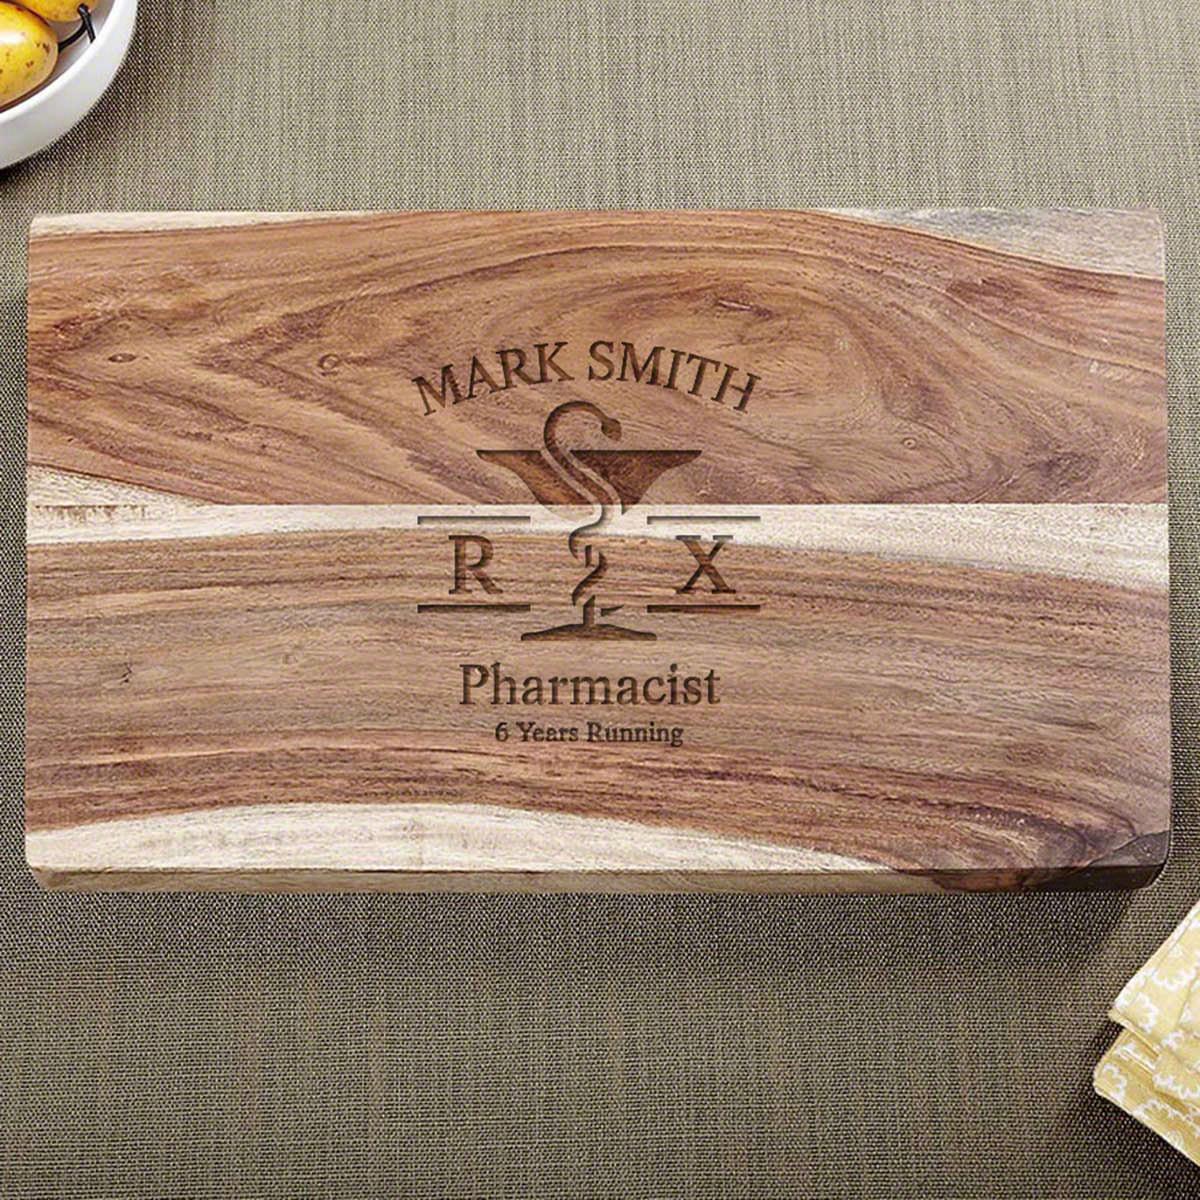 Mortar and Pestle Custom Hardwood Cutting Board Gift for Pharmacist